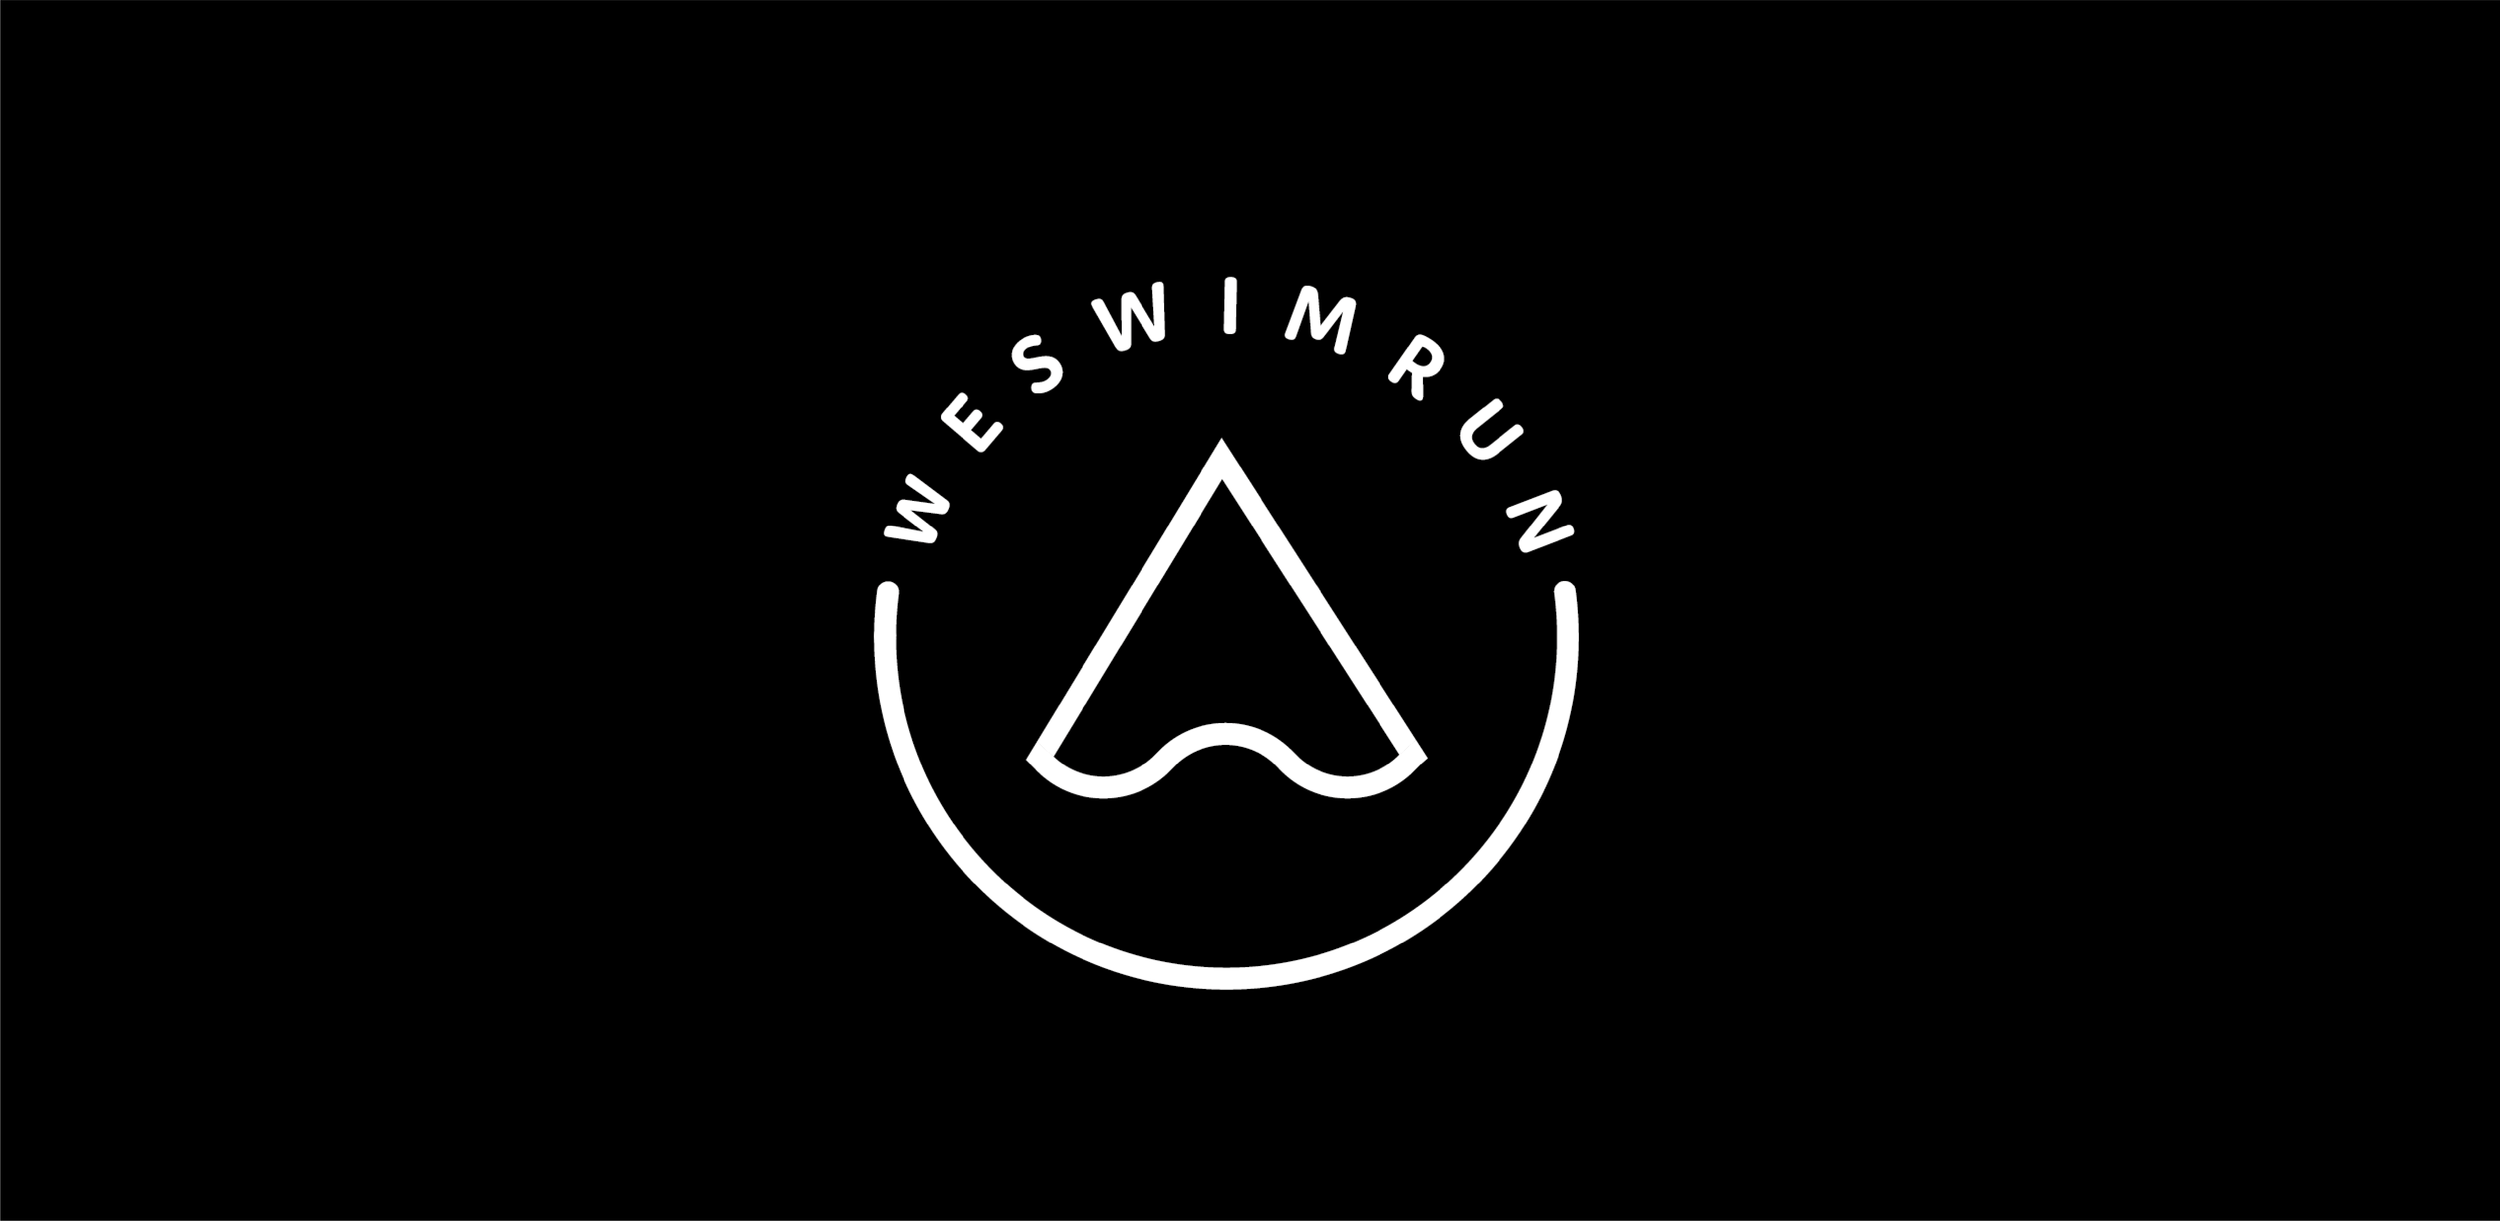 weswimrun-13.png